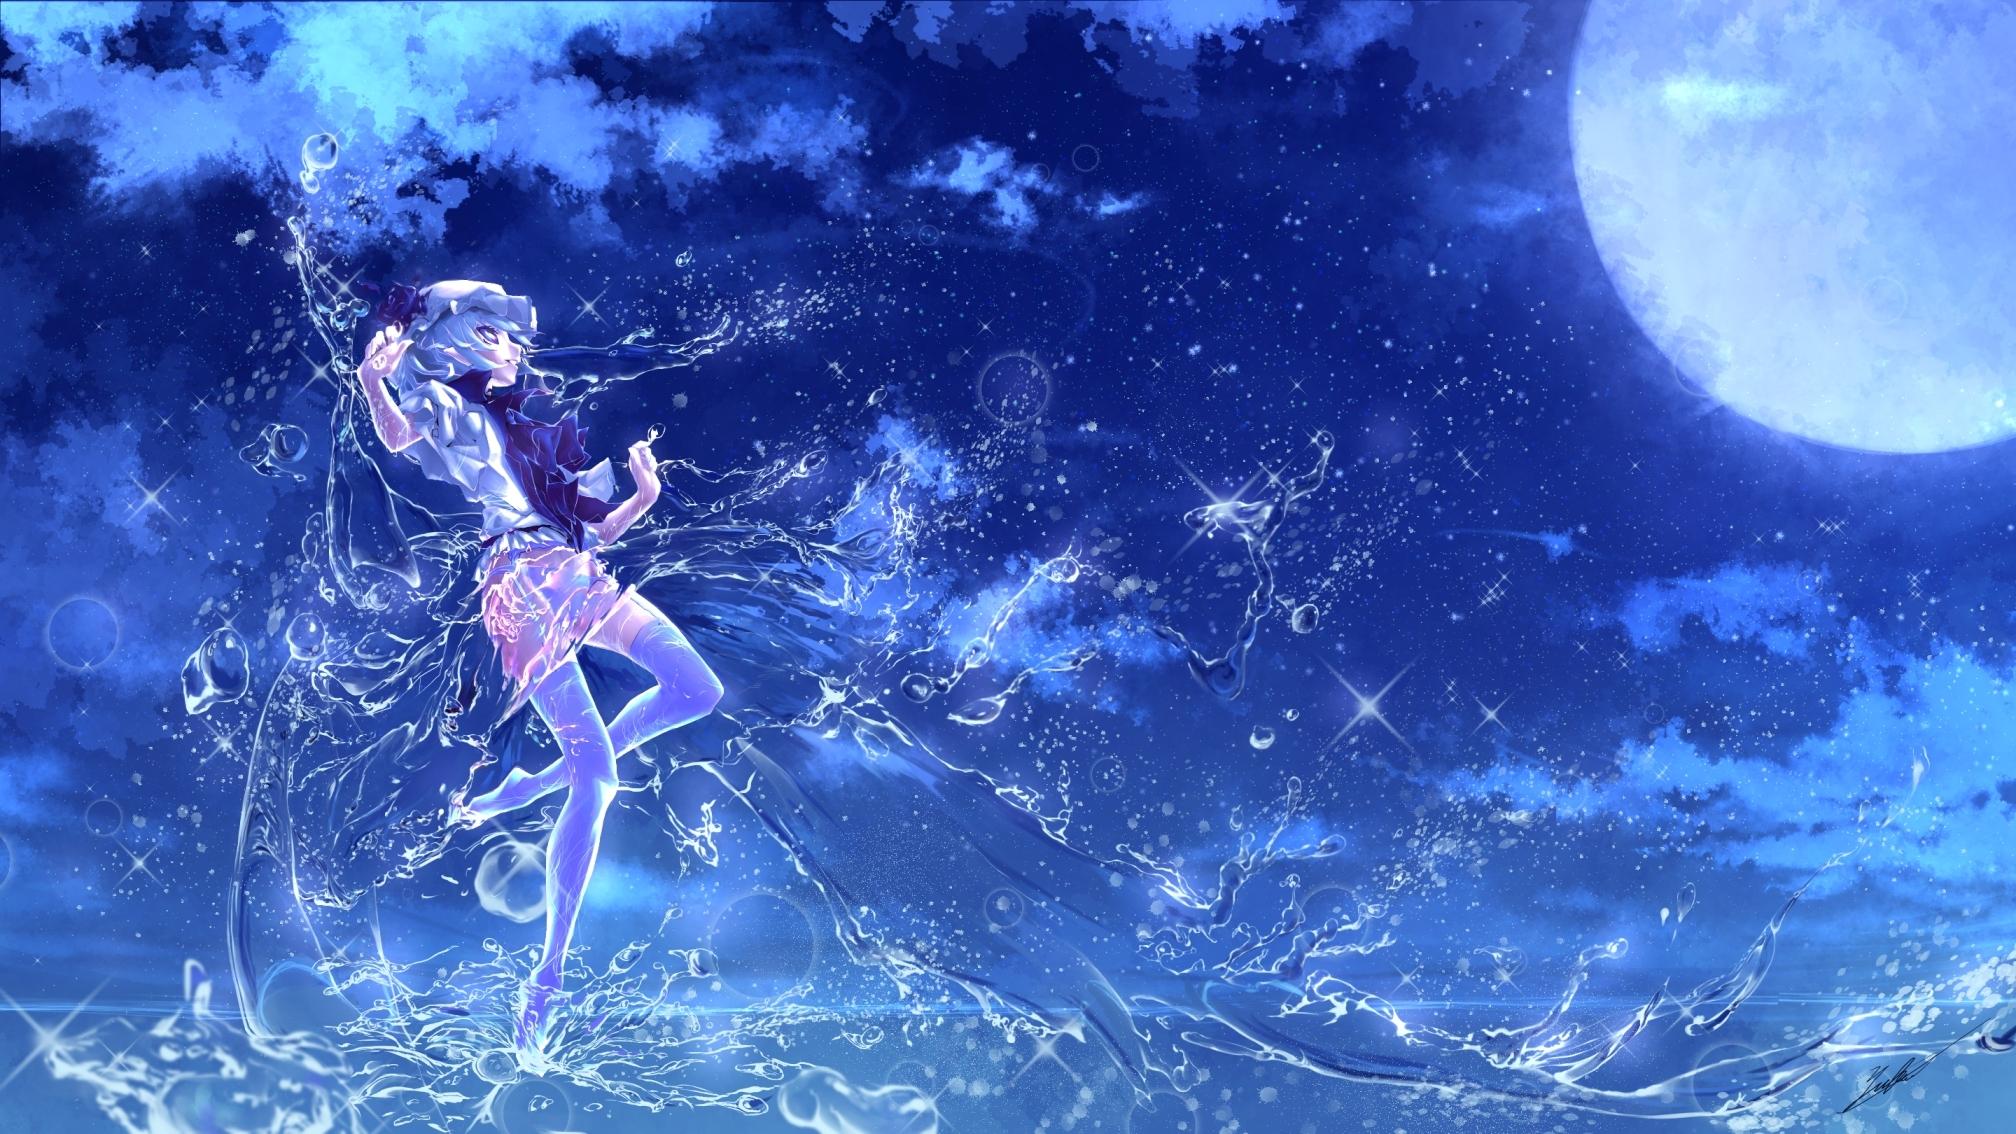 touhou anime art water girl full moon glitter background 2016x1134